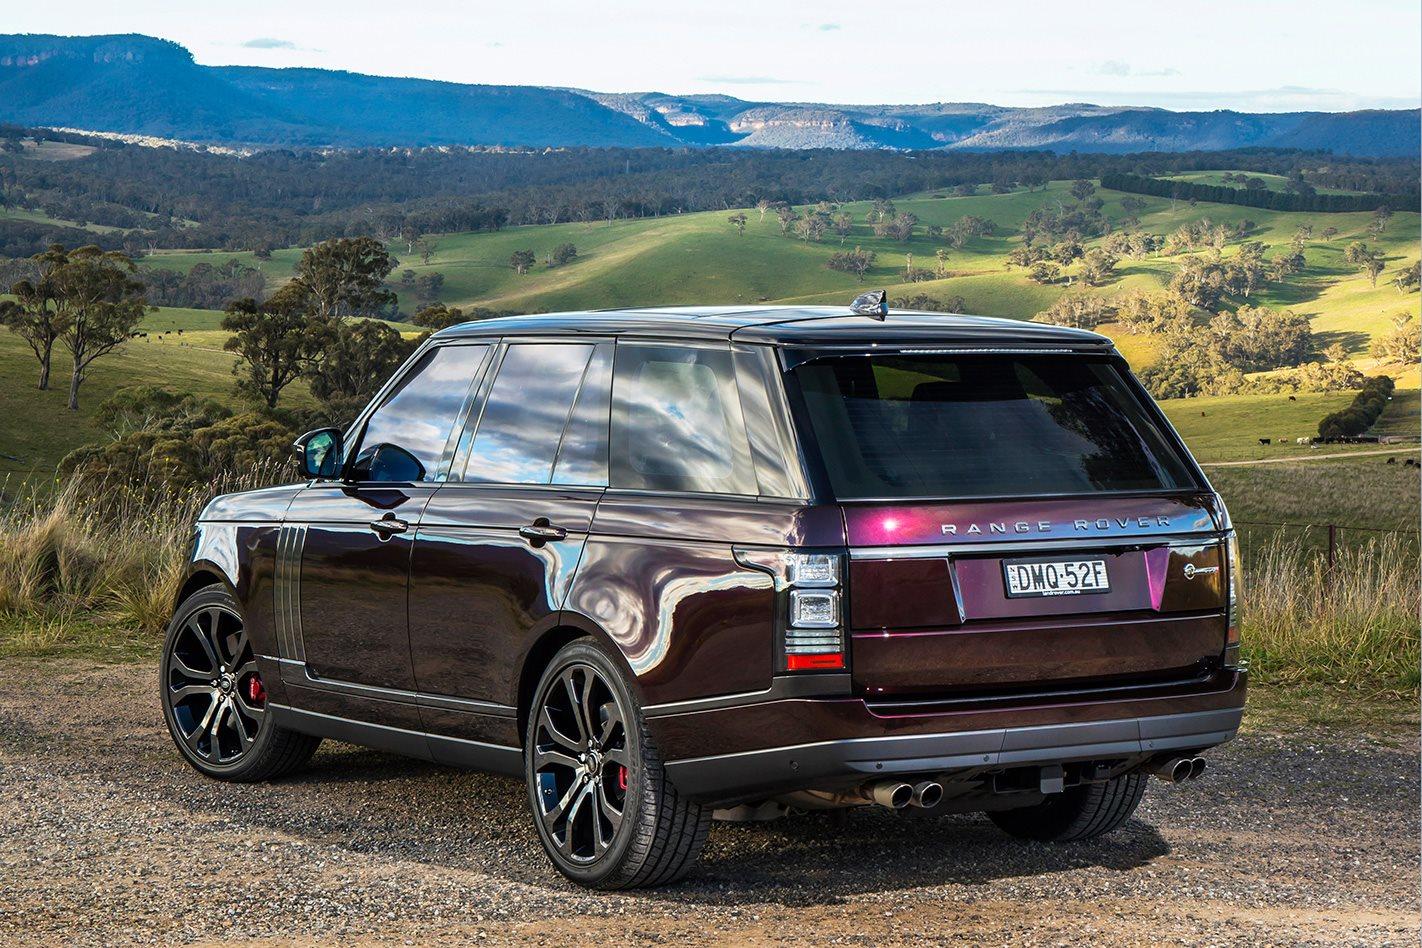 2018 Range Rover SV Autobiography Rear